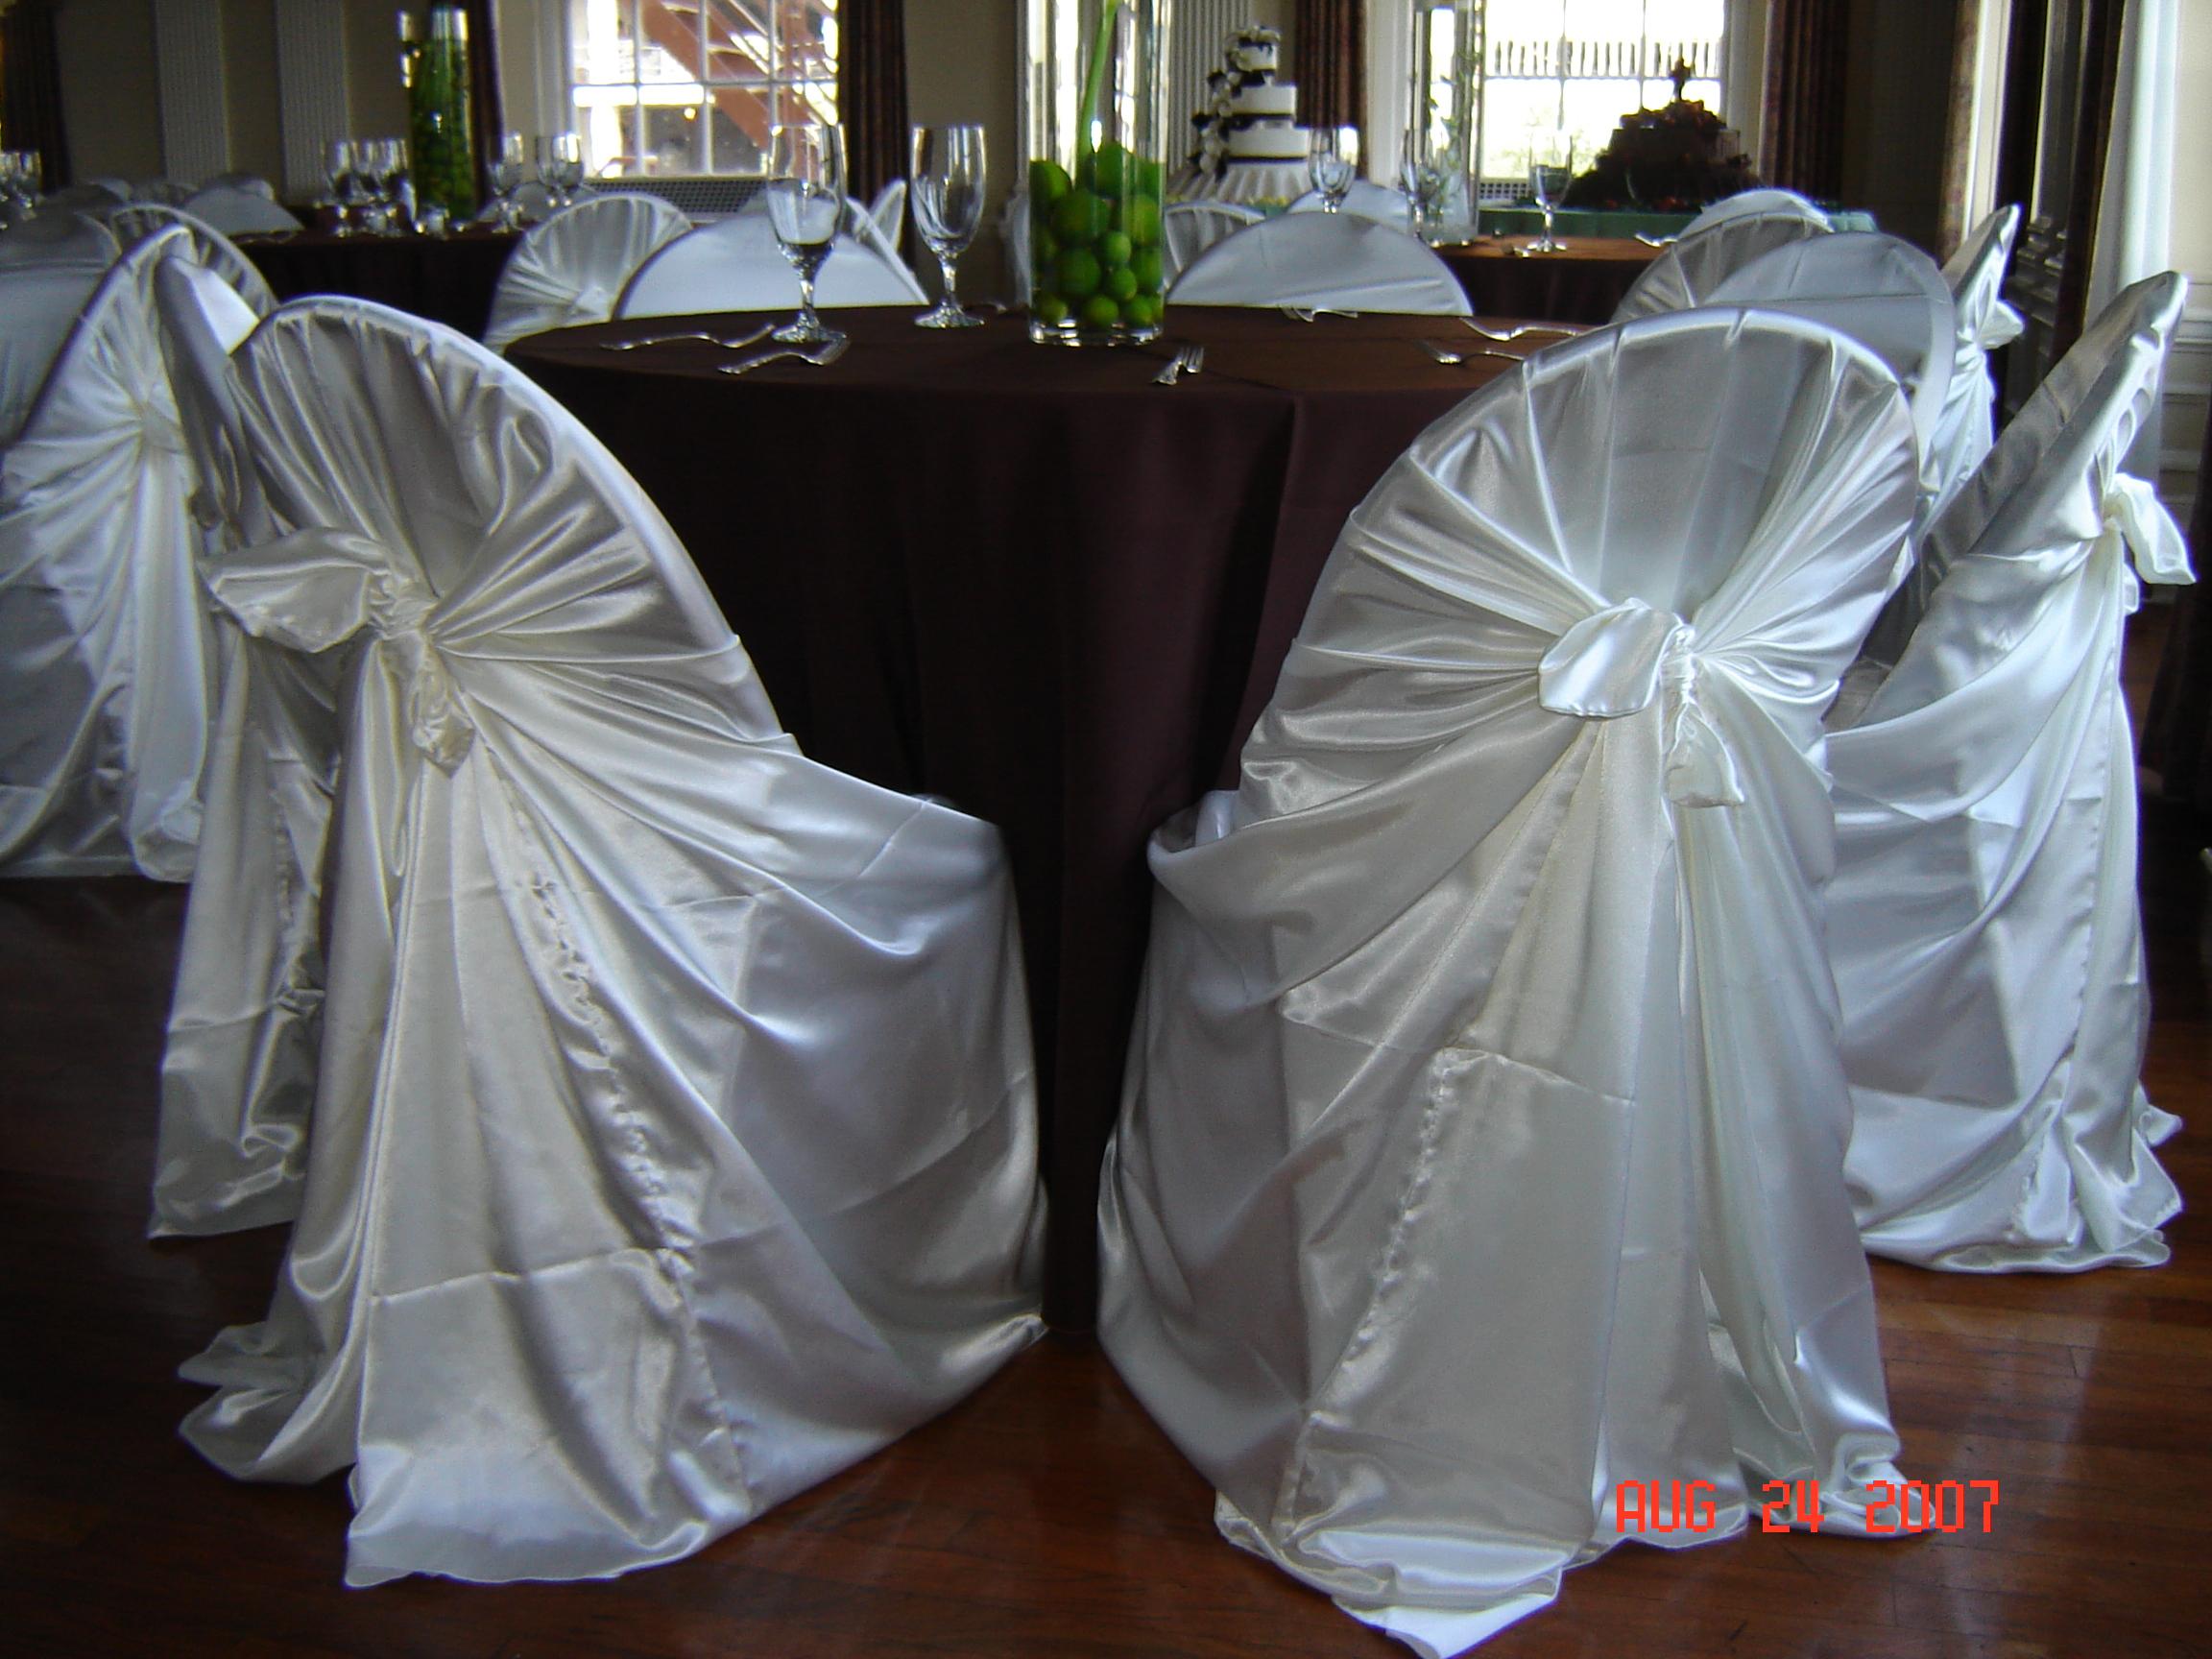 chair cover rentals dallas texas wheelchair buy simply elegant weddings wedding